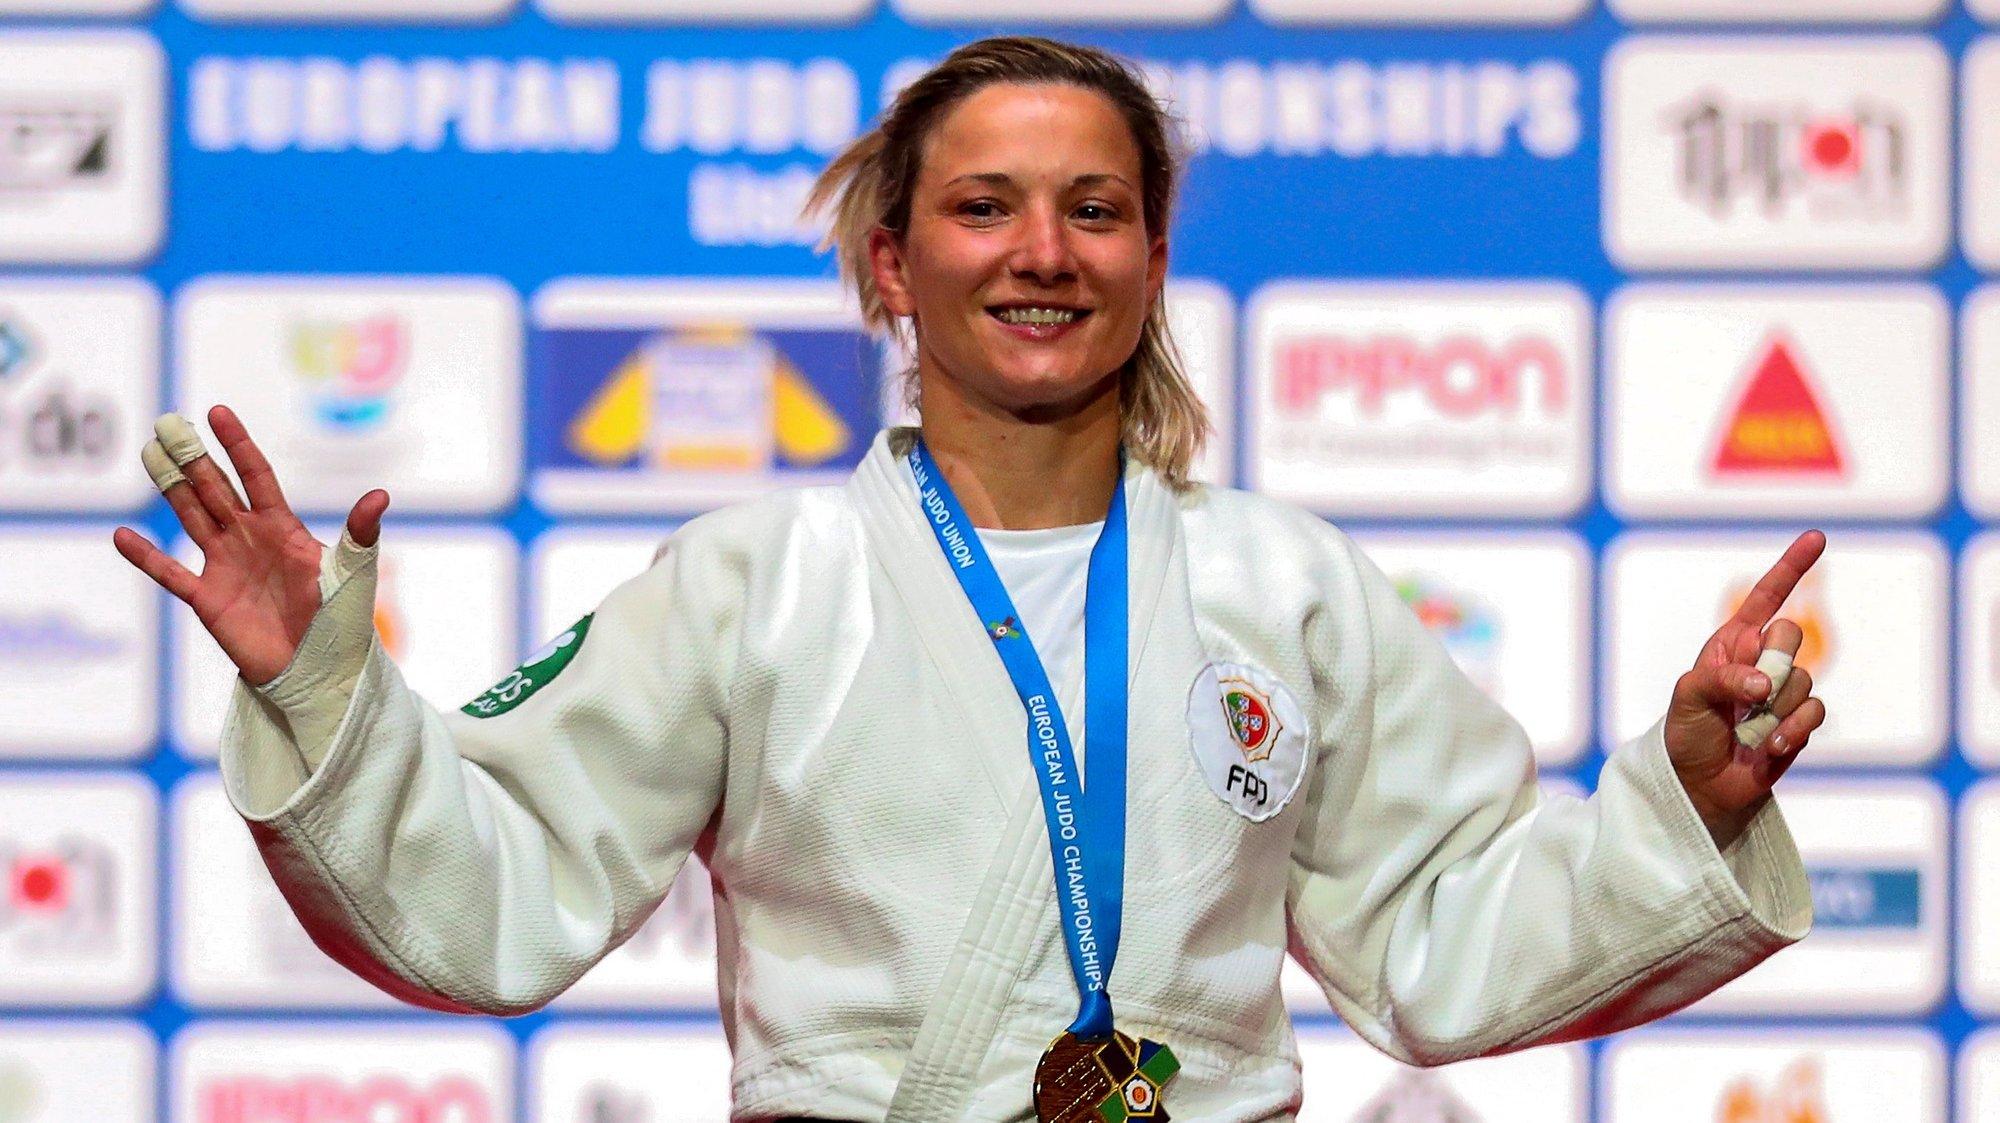 epa09140115 Telma Monteiro of Portugal celebrates on the podium after beating Kaja Kajzer of Slovenia in their gold medal bout of the women's -57kg category at the European Judo Championships in Lisbon, Portugal, 16 April 2021.  EPA/NUNO VEIGA